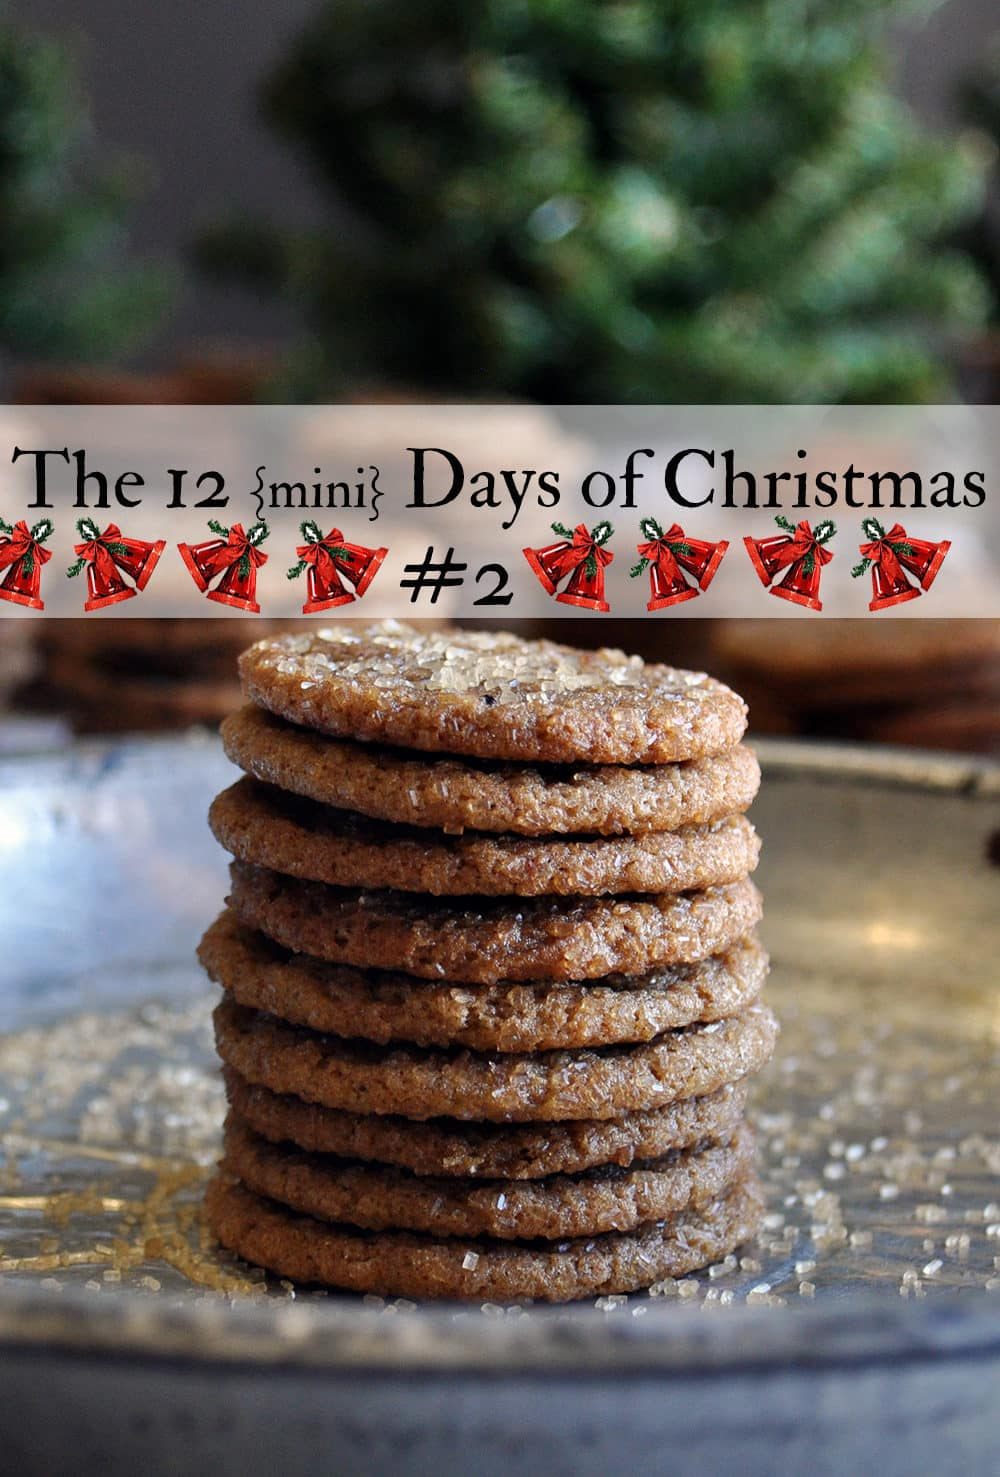 Mini Sorghum Ginger Cookies | The 12 mini days of Christmas | ofbatteranddough.com